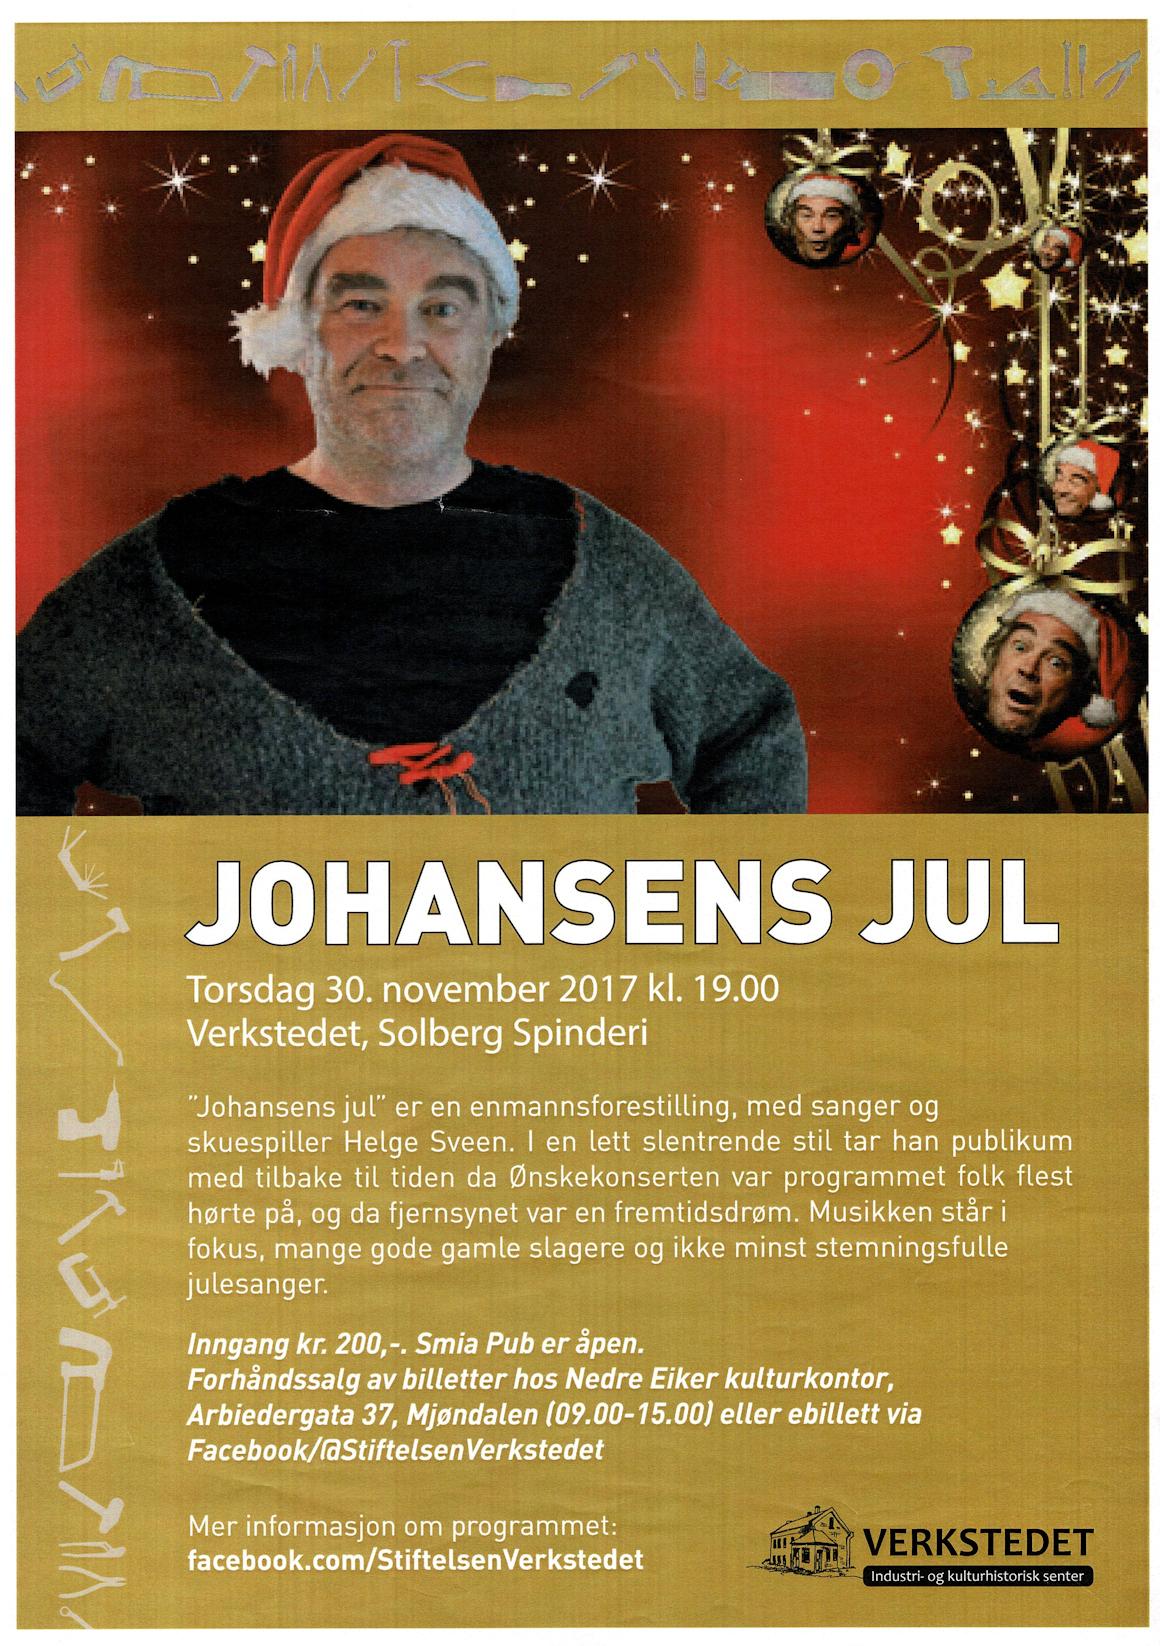 Johansens jul @ Verkstedet, Solberg Spinderi | Buskerud | Norge